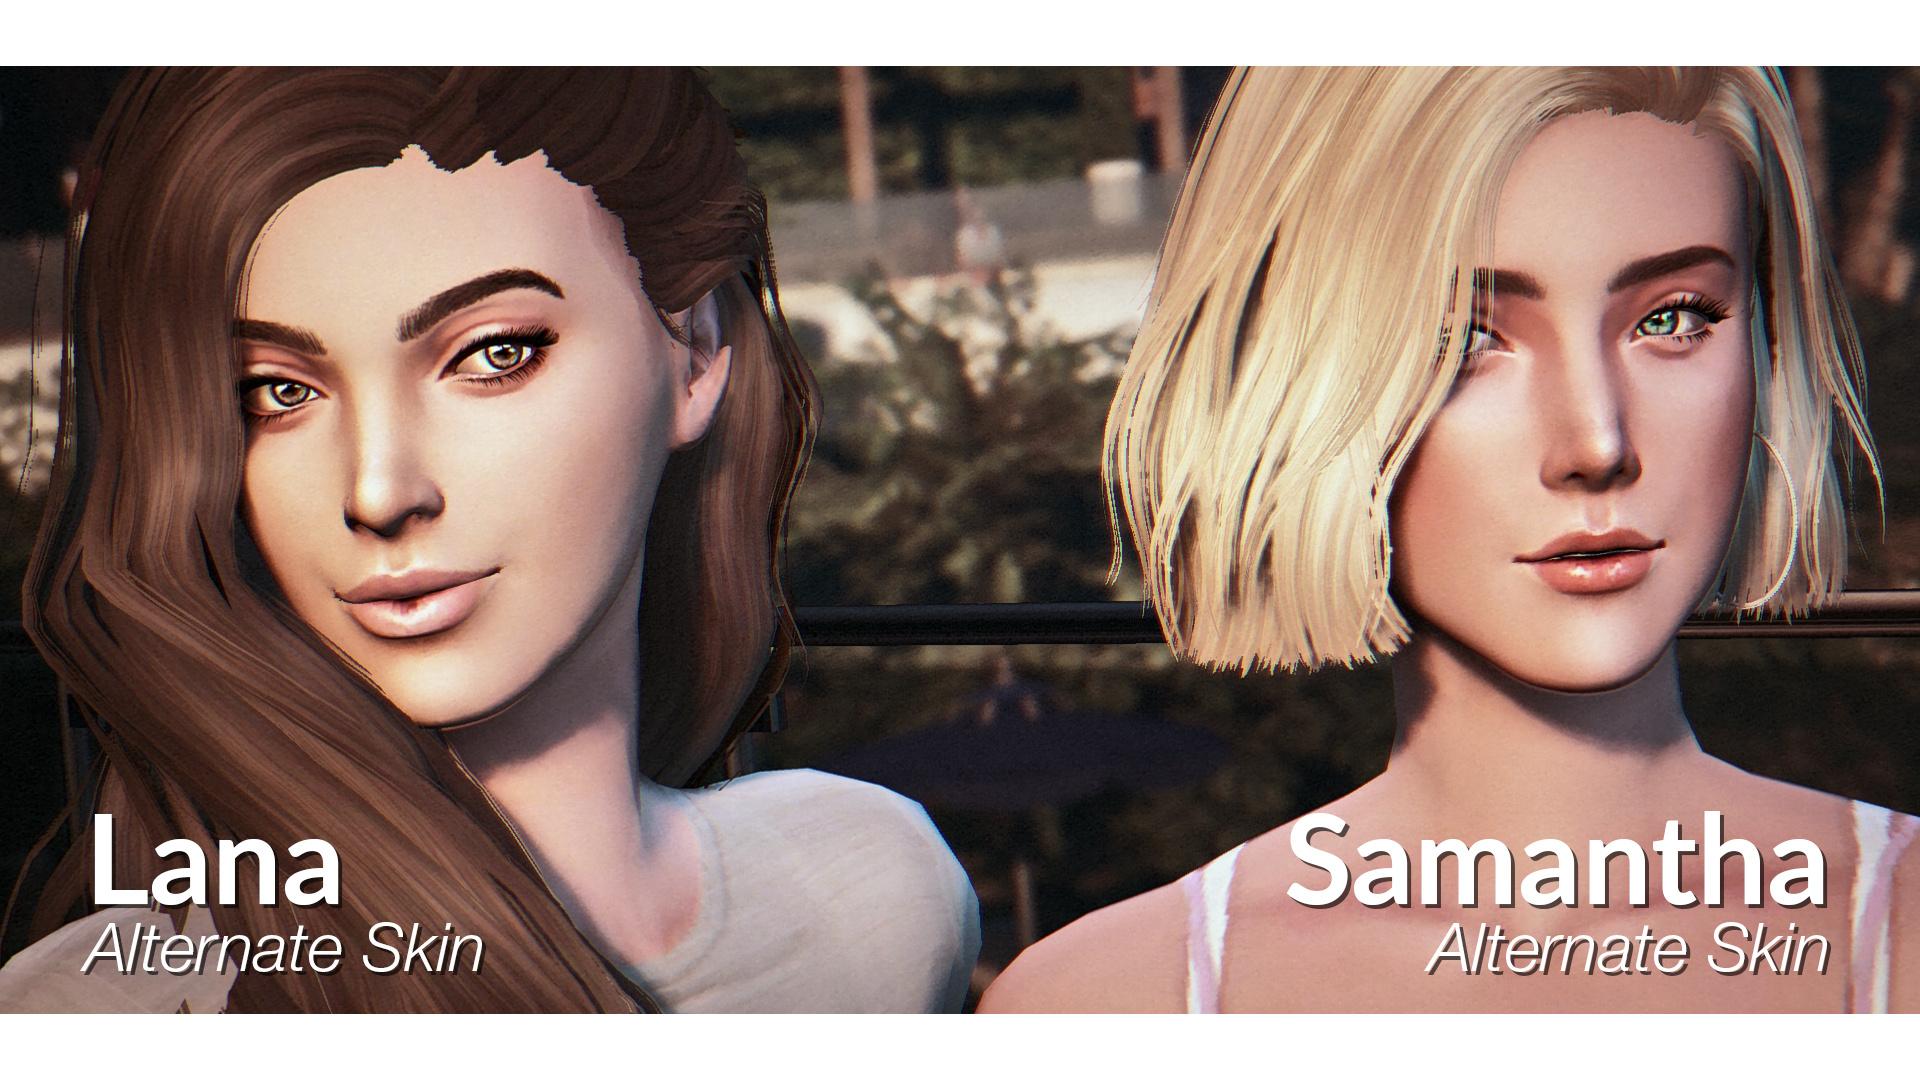 Sims 4 Custom Female Ped Add On Ped Replace Gta5 Mods